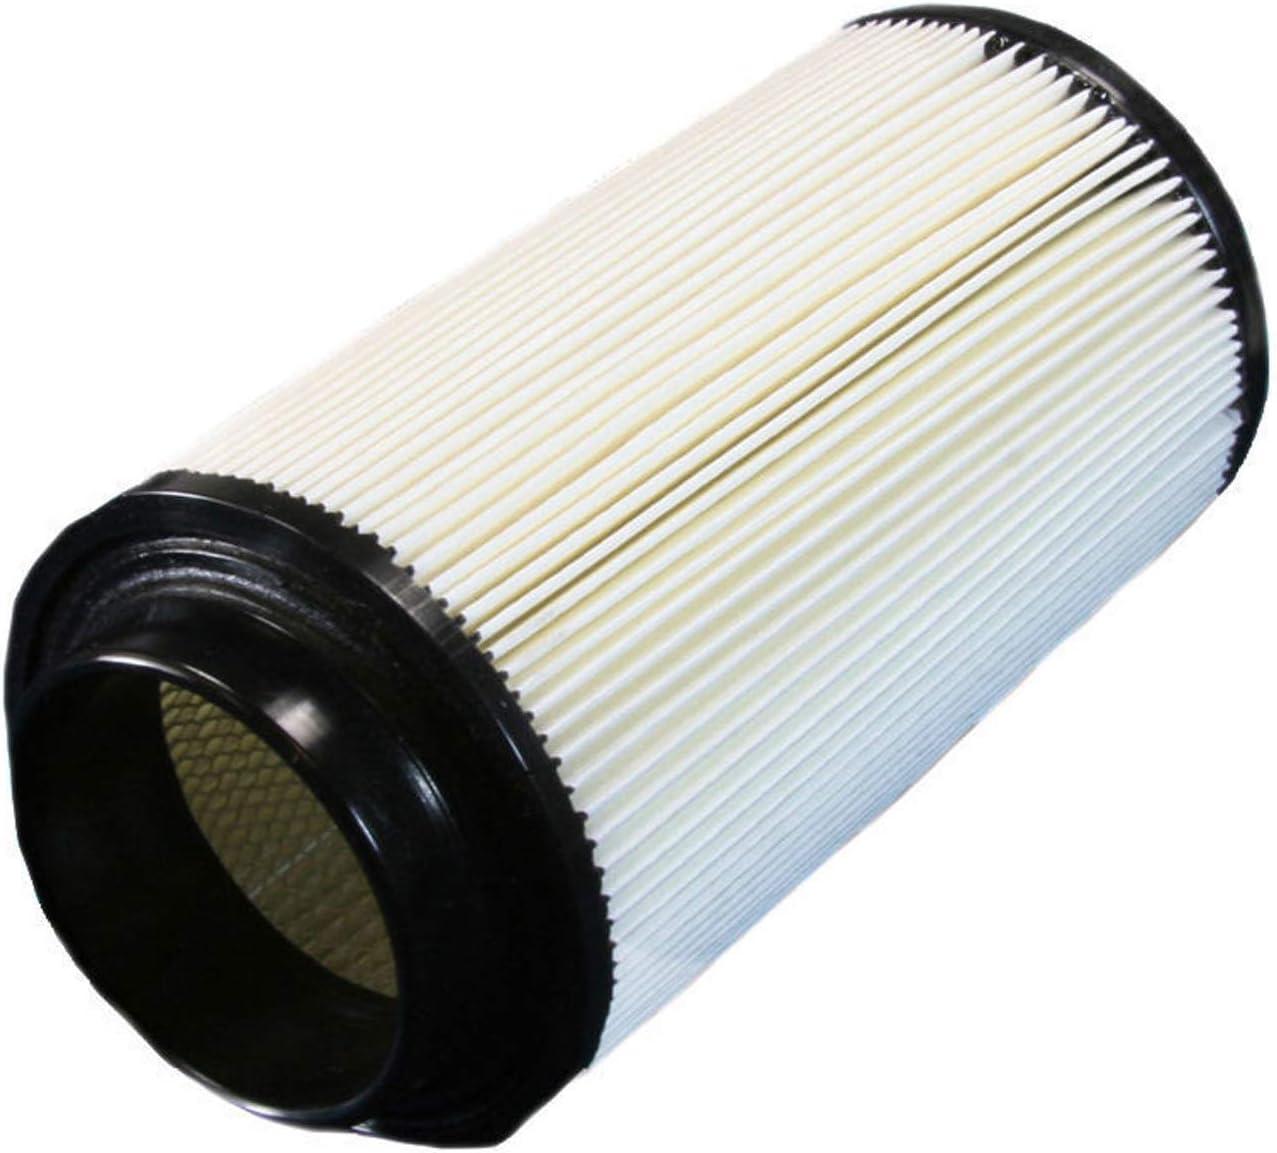 For Polaris Magnum Sportsman Air Filter 400 500 700 800 550 850 #7080595 Cleaner